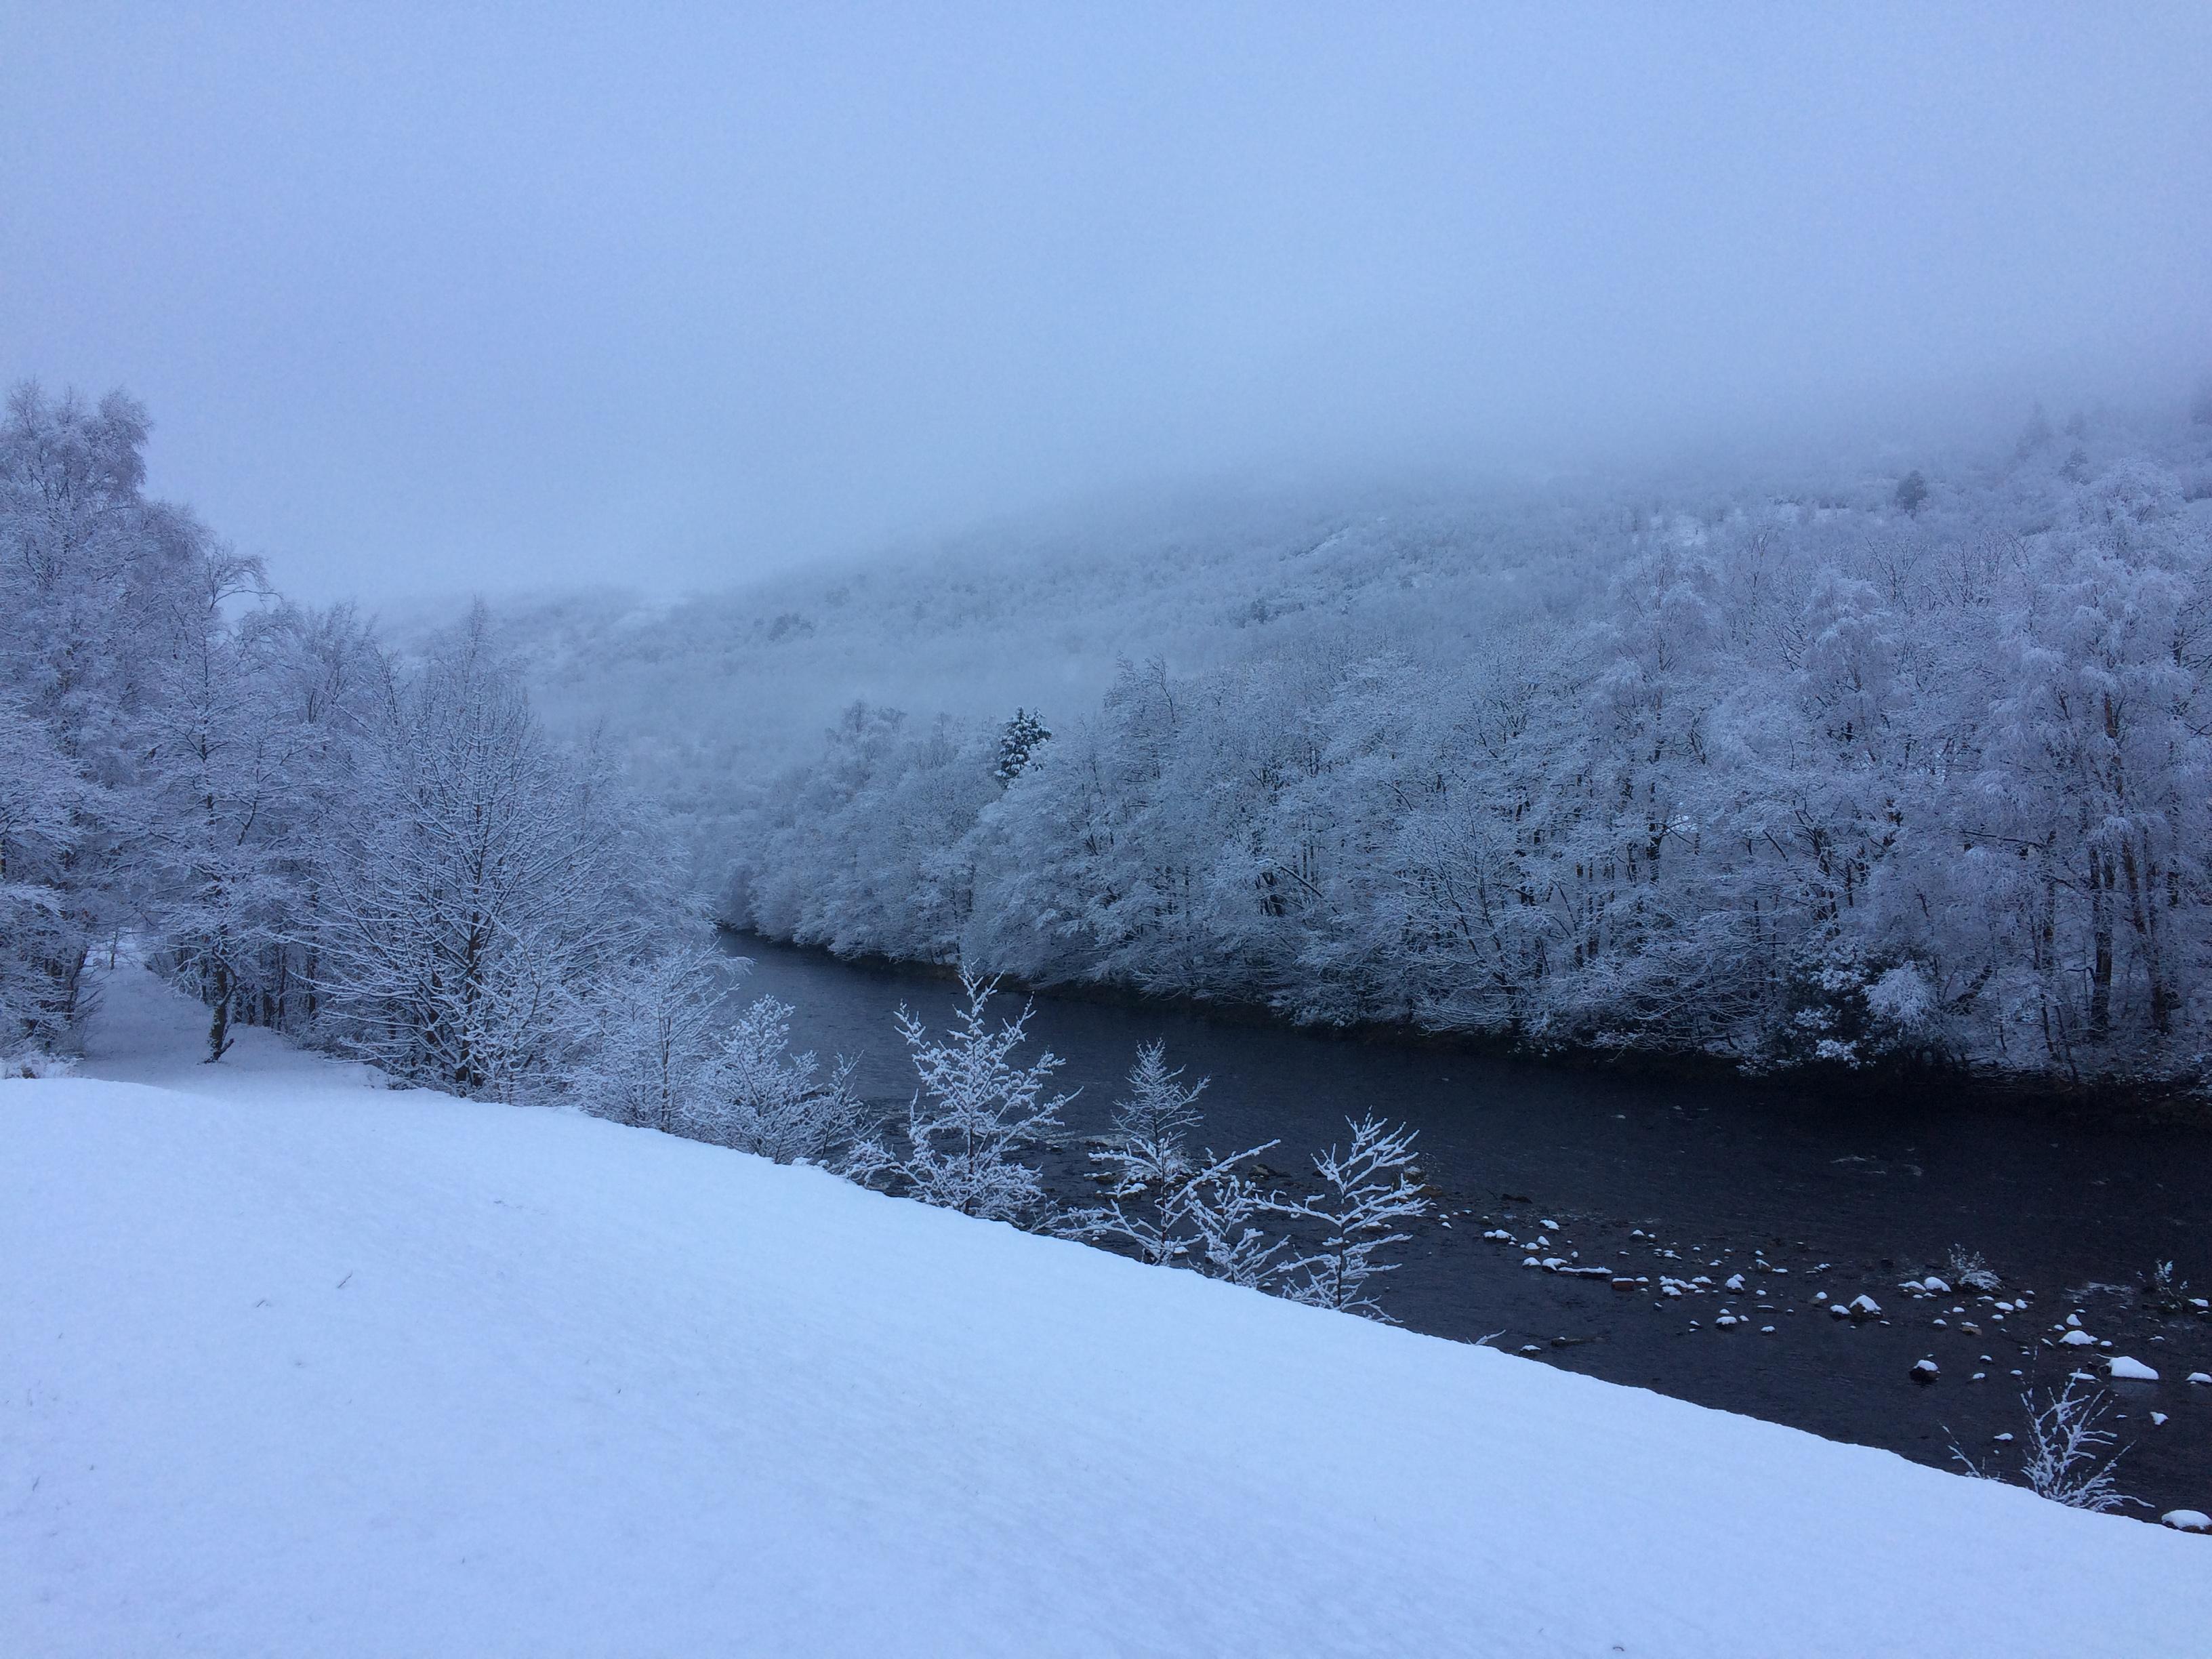 WHWH snowy river Jan 2019